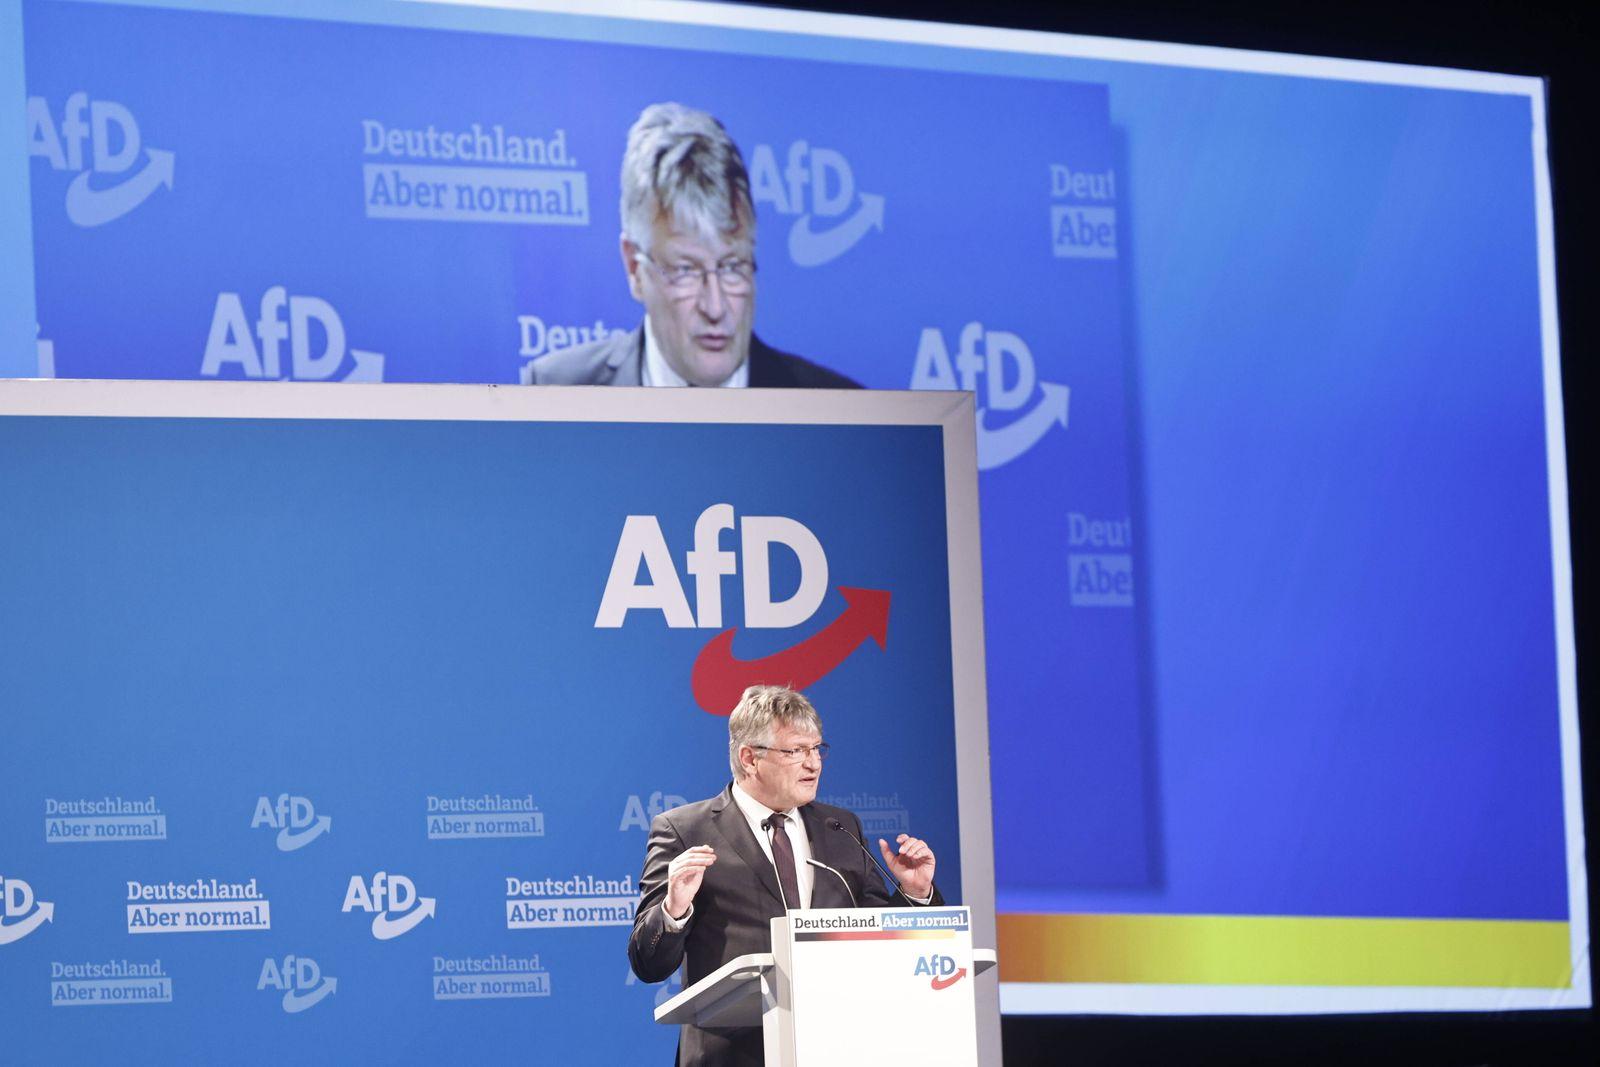 12. Bundesparteitag der AFD, vom 10.-11.04.2021 in der Messe Dresden. Jörg Meuthen. Dresden Sachsen GERMANY *** 12 Fede